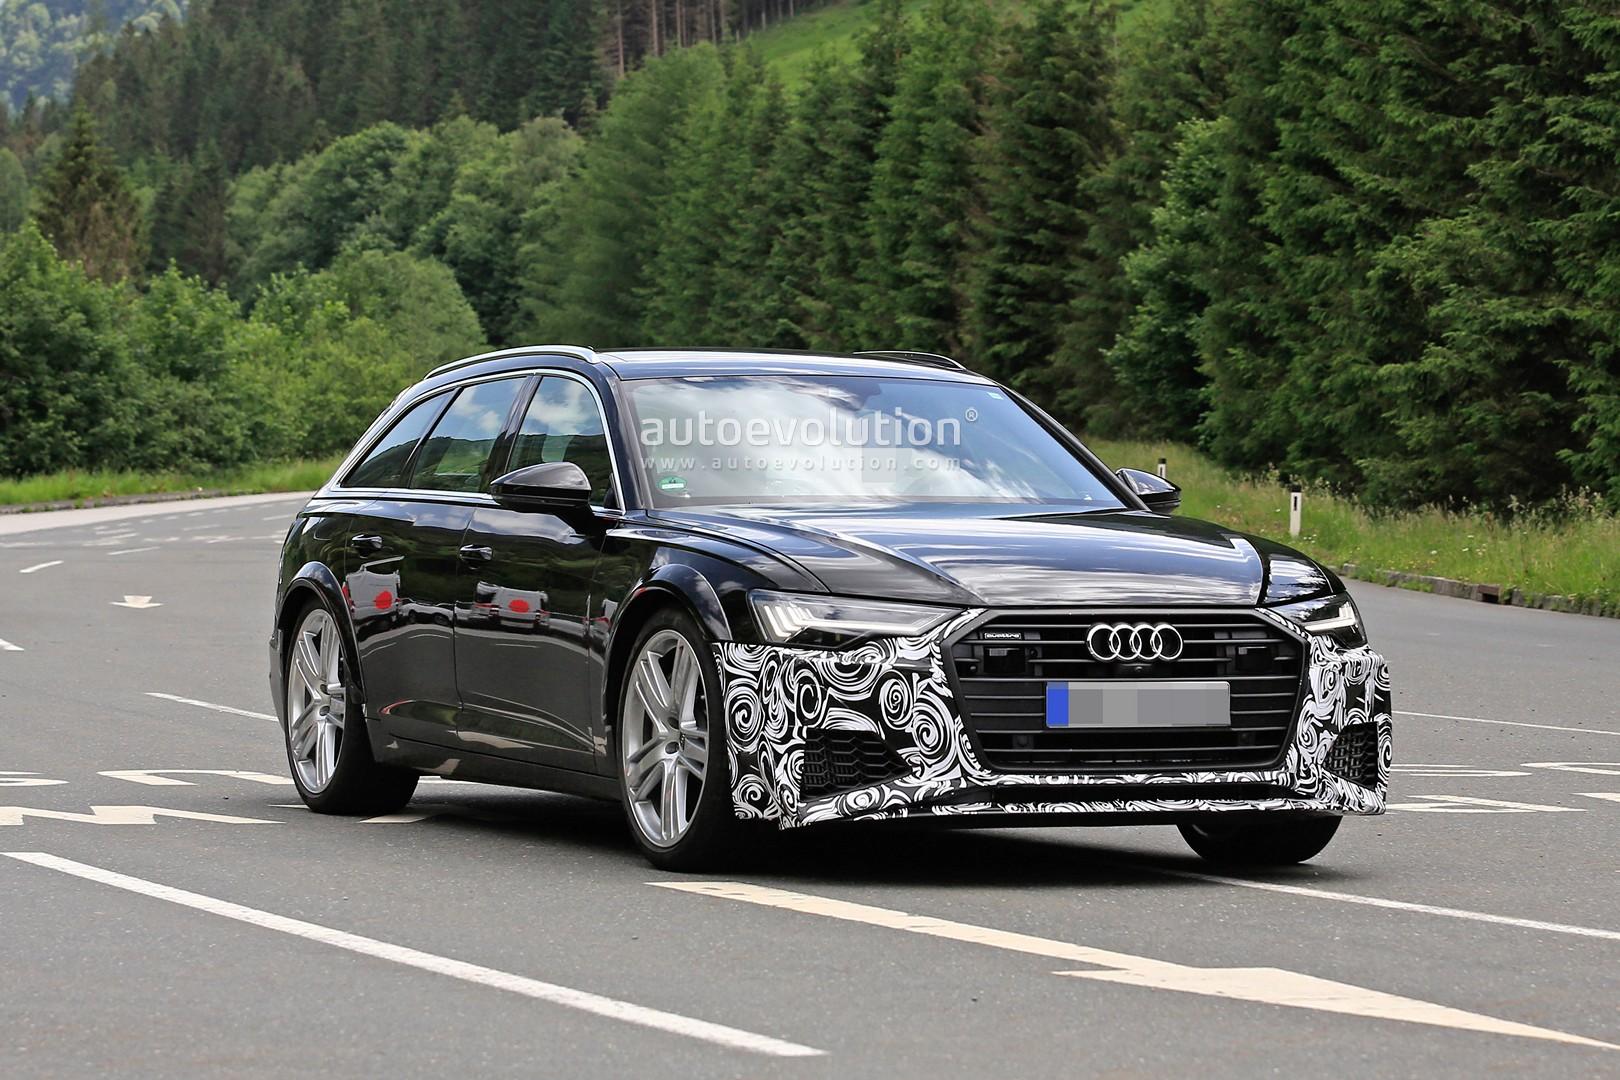 2020 Audi Rs6 Avant Makes Spy Photo Debut Autoevolution